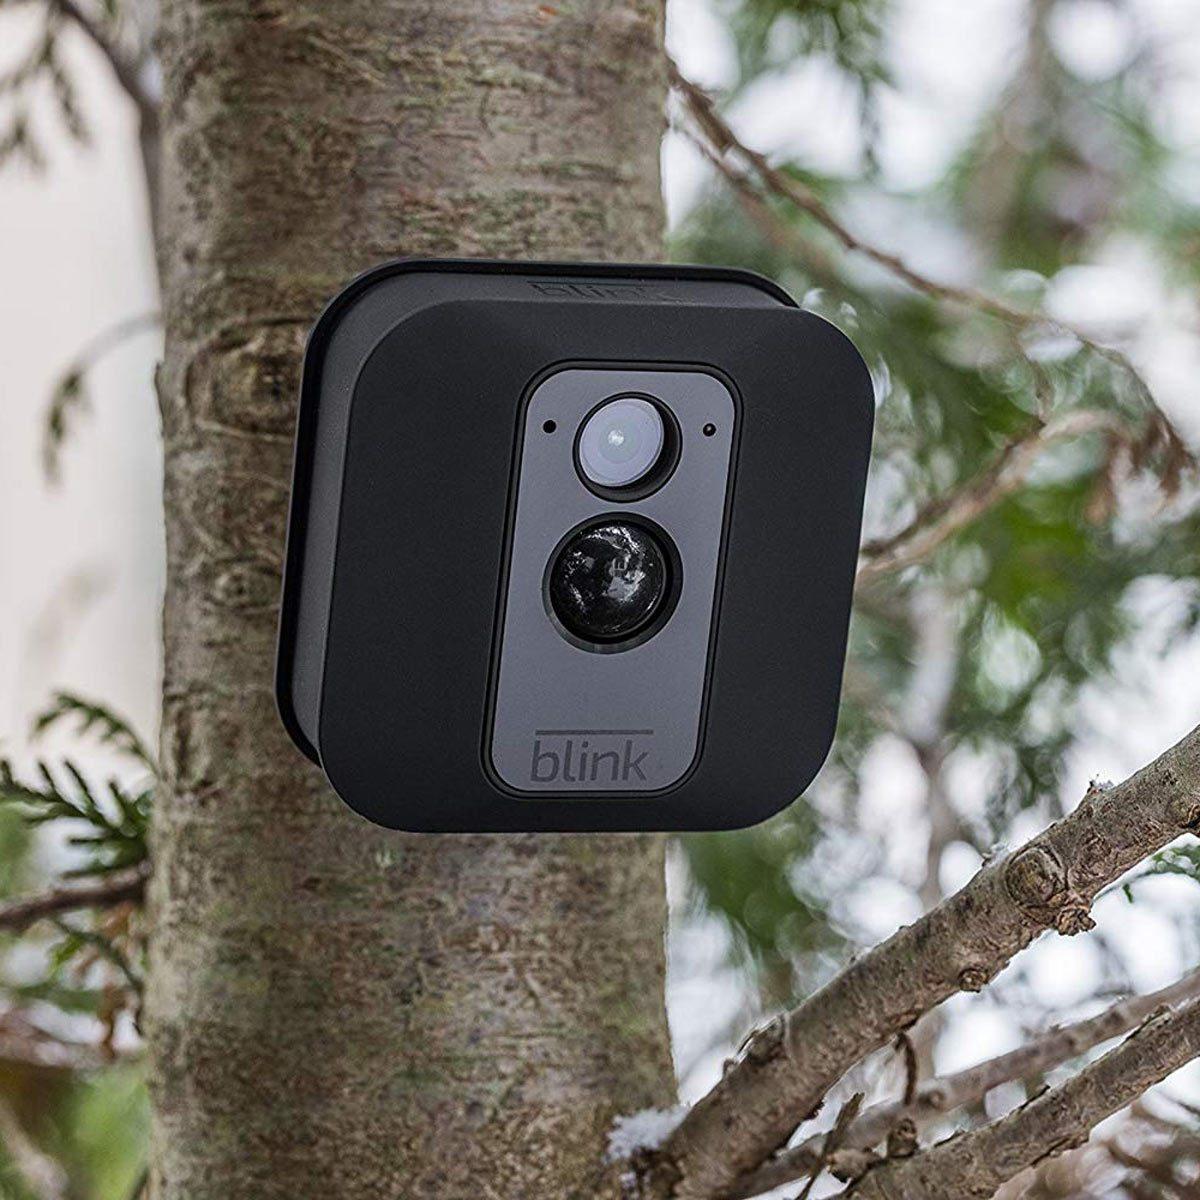 Blink wireless camera